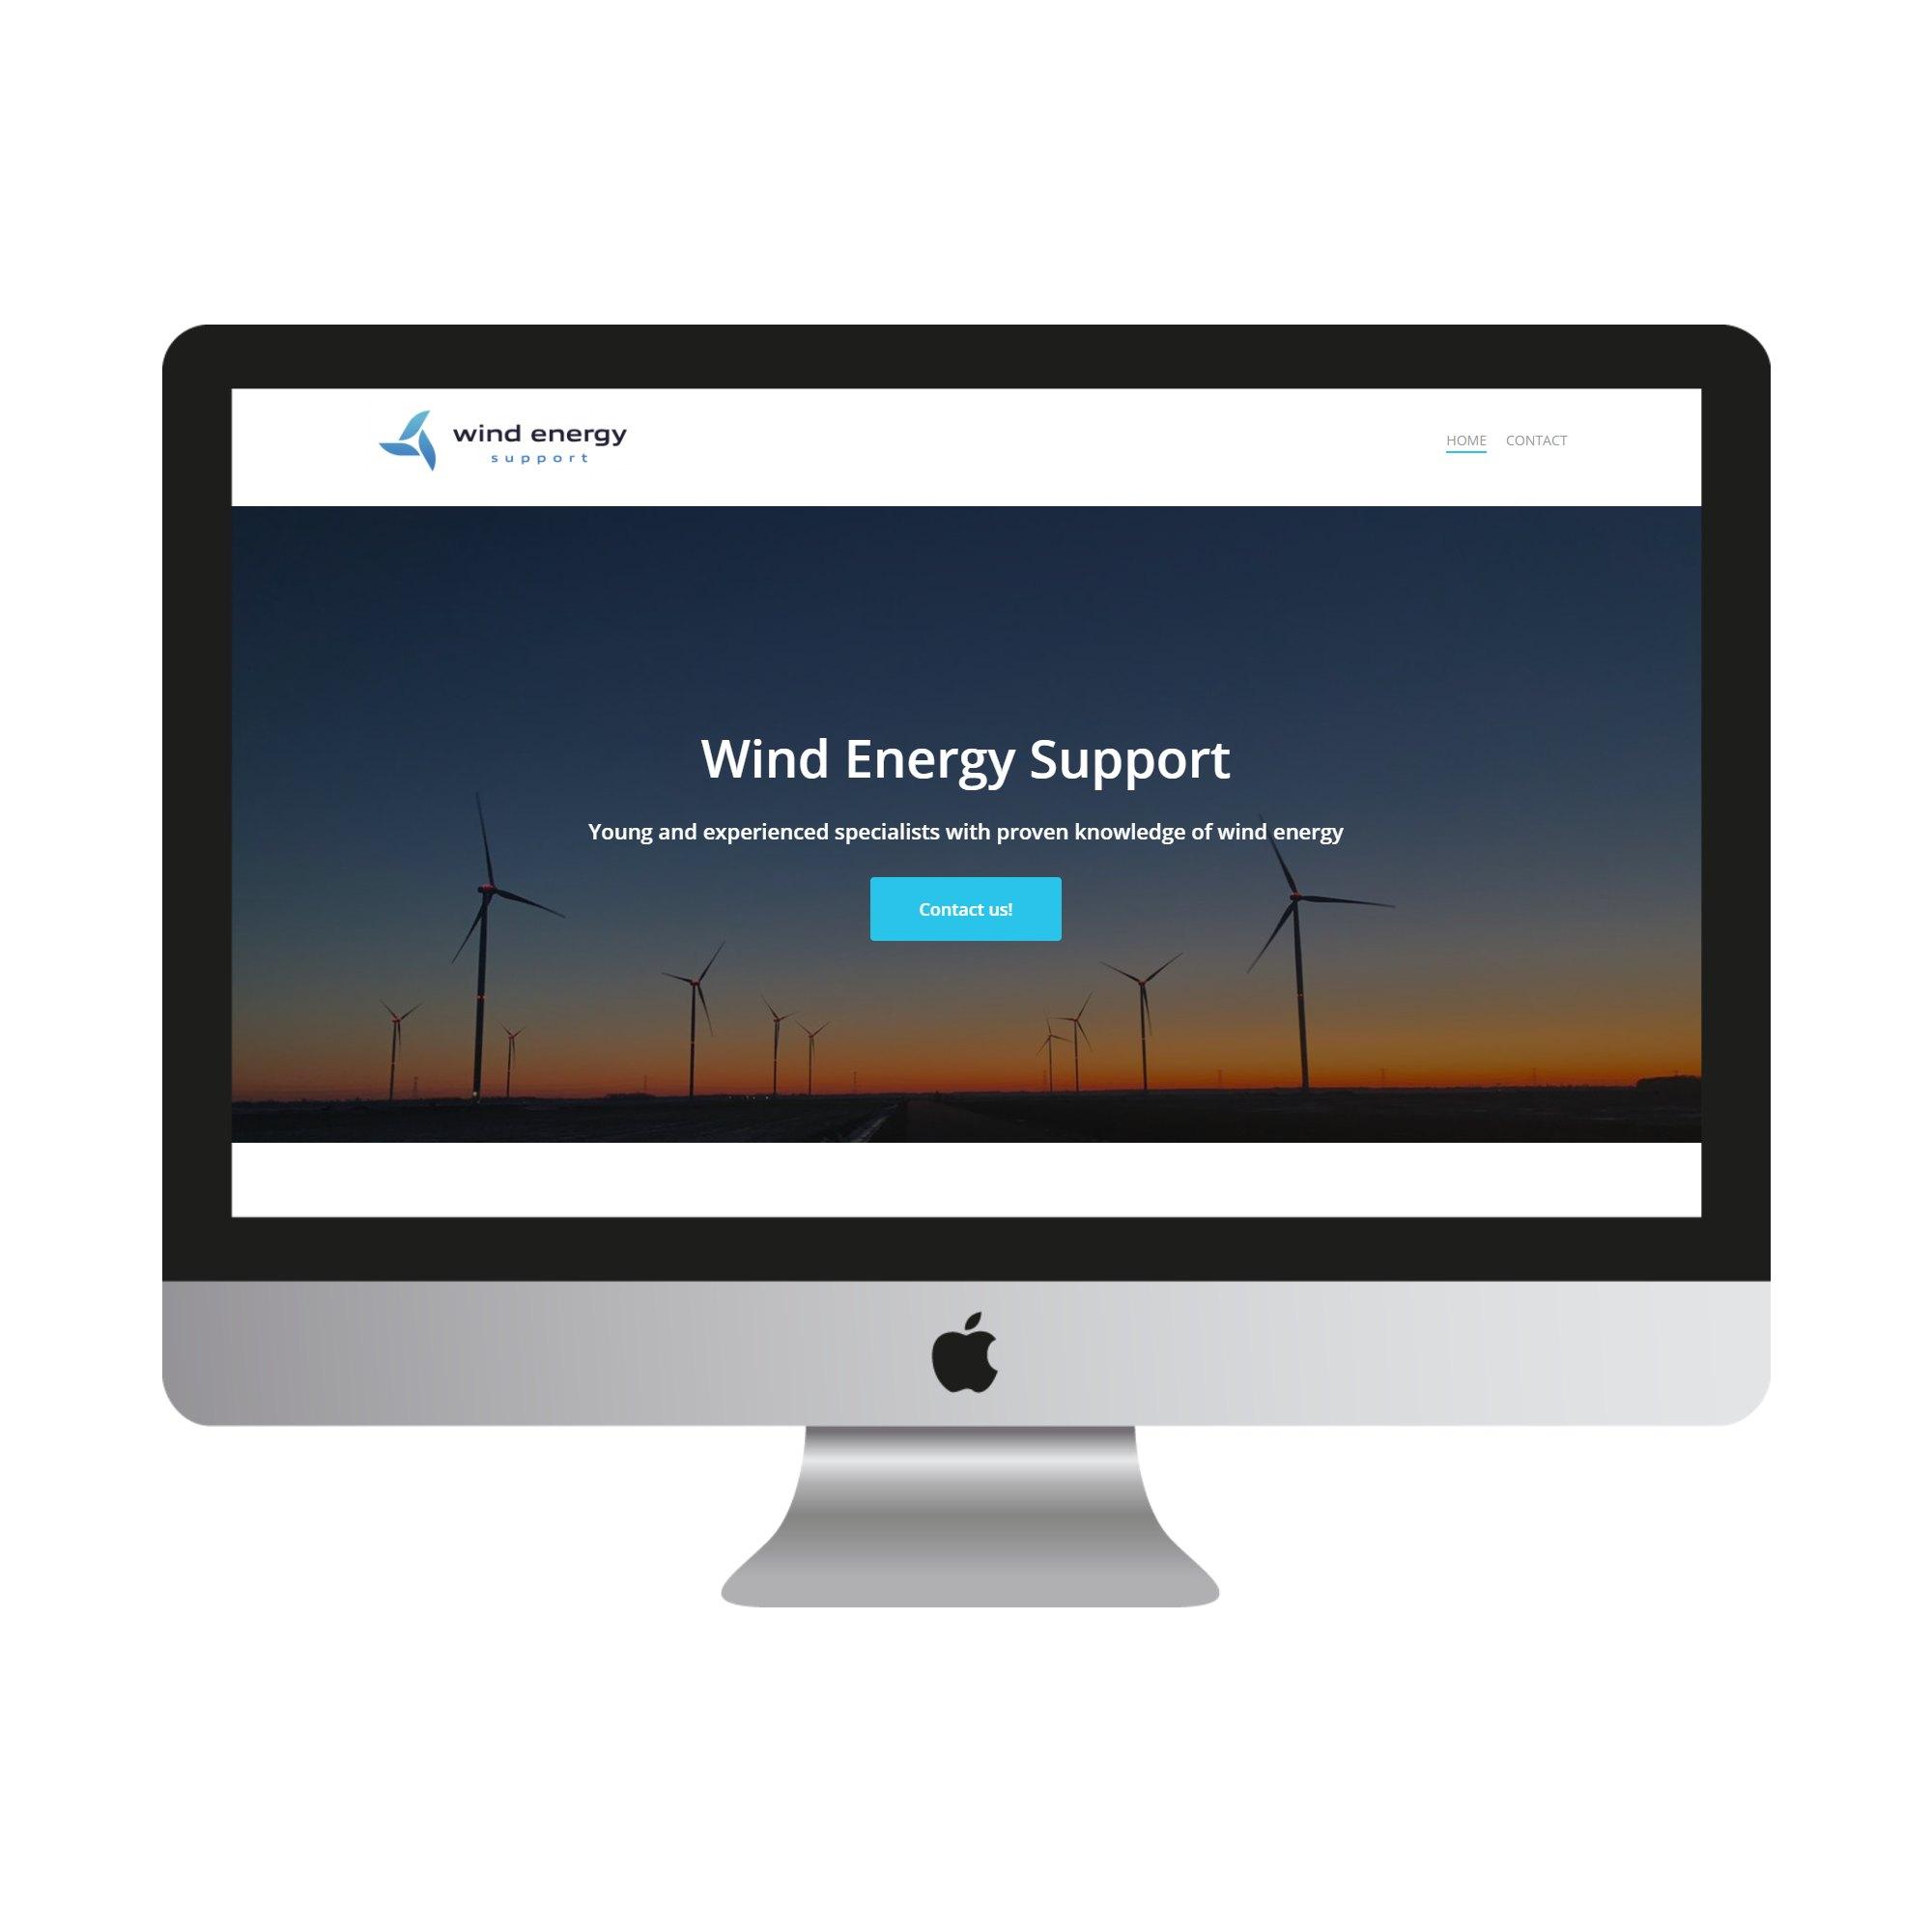 Wind Energy Support website